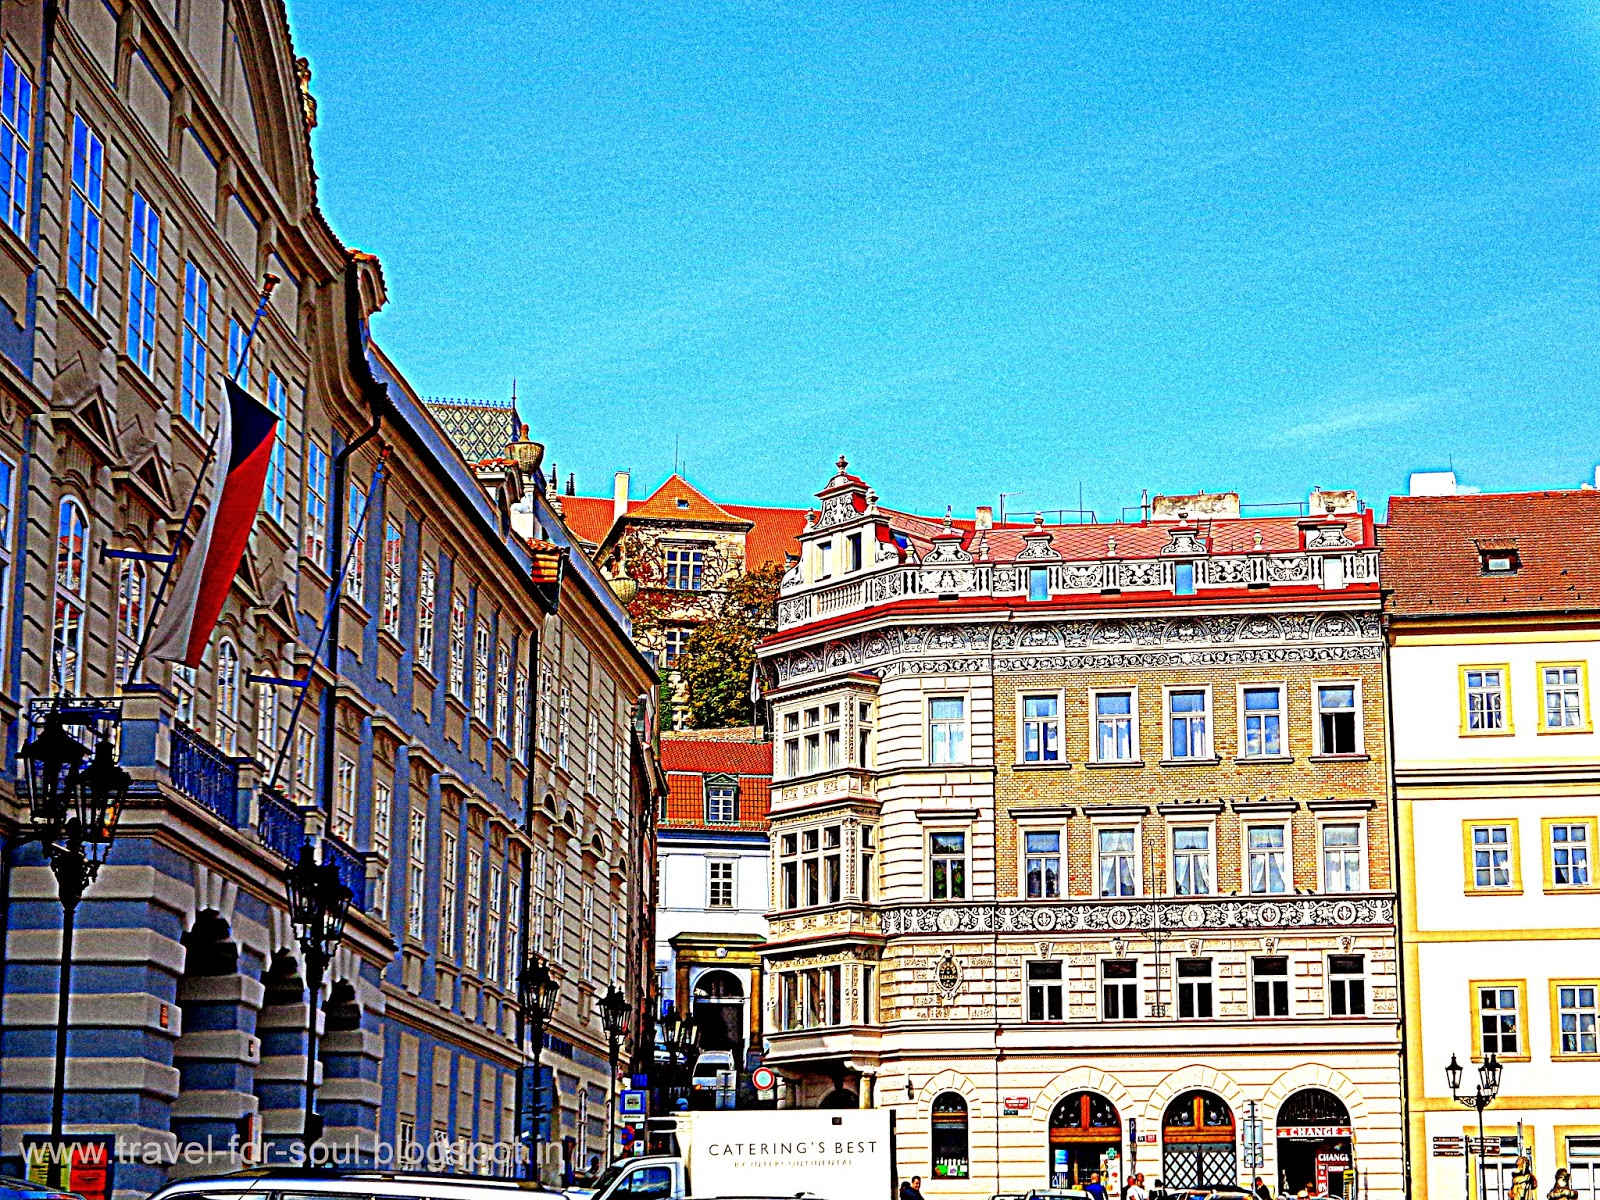 Downhill Prague